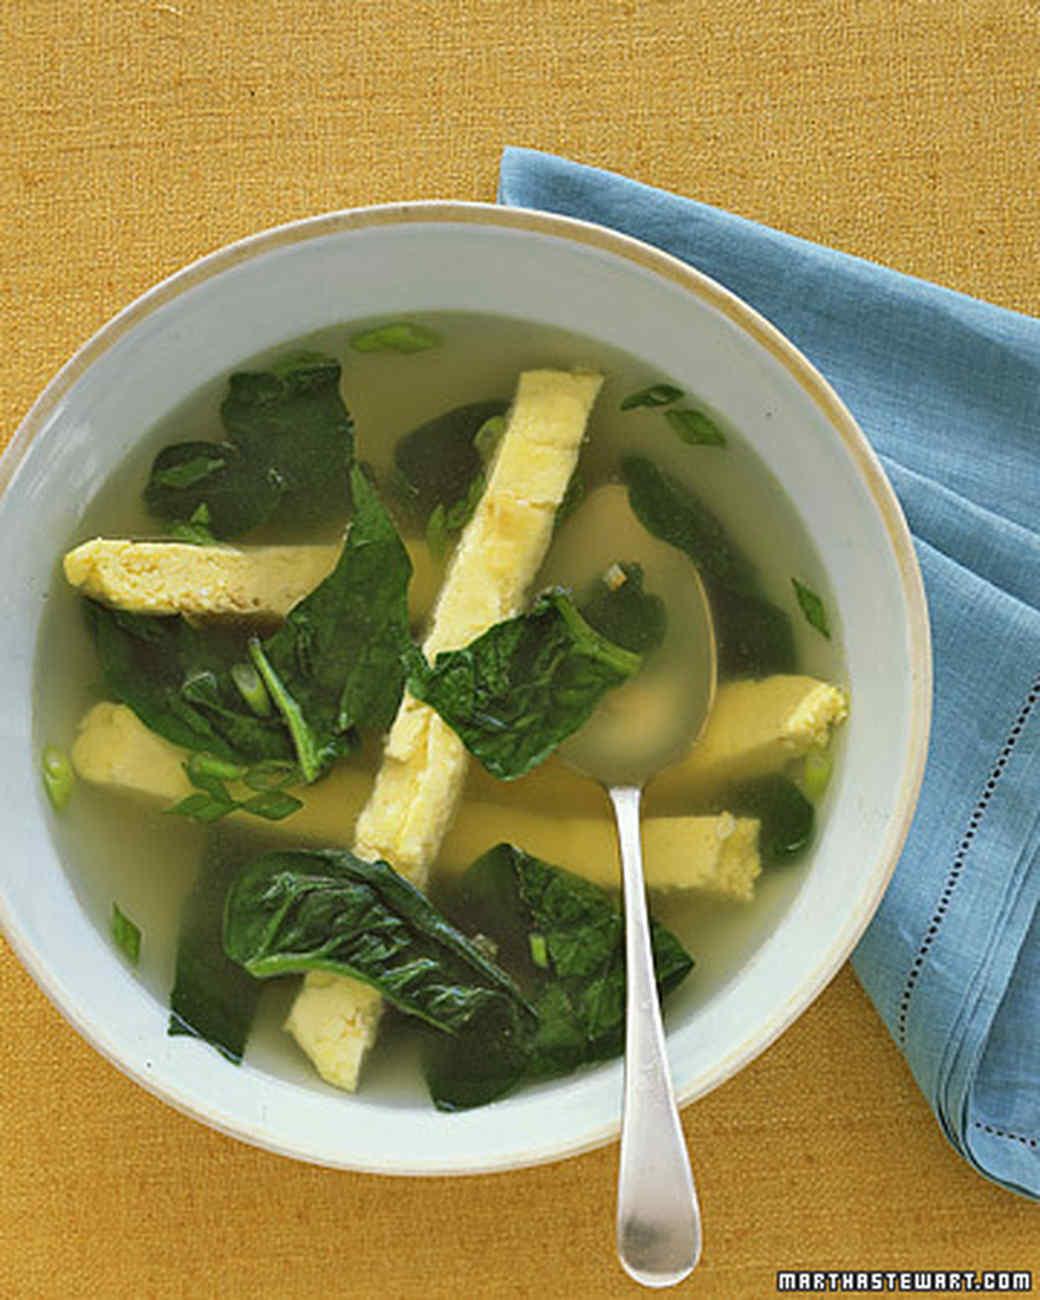 ba102038_0506_spinachsoup.jpg